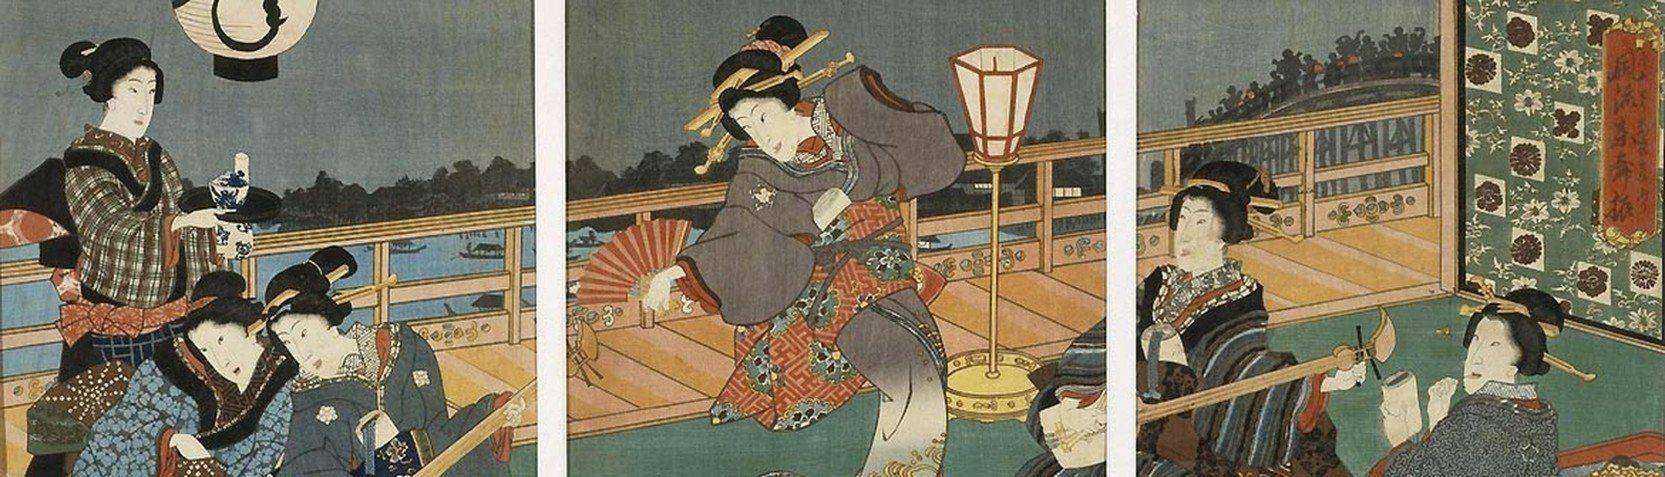 Artistes - Utagawa Kunisada